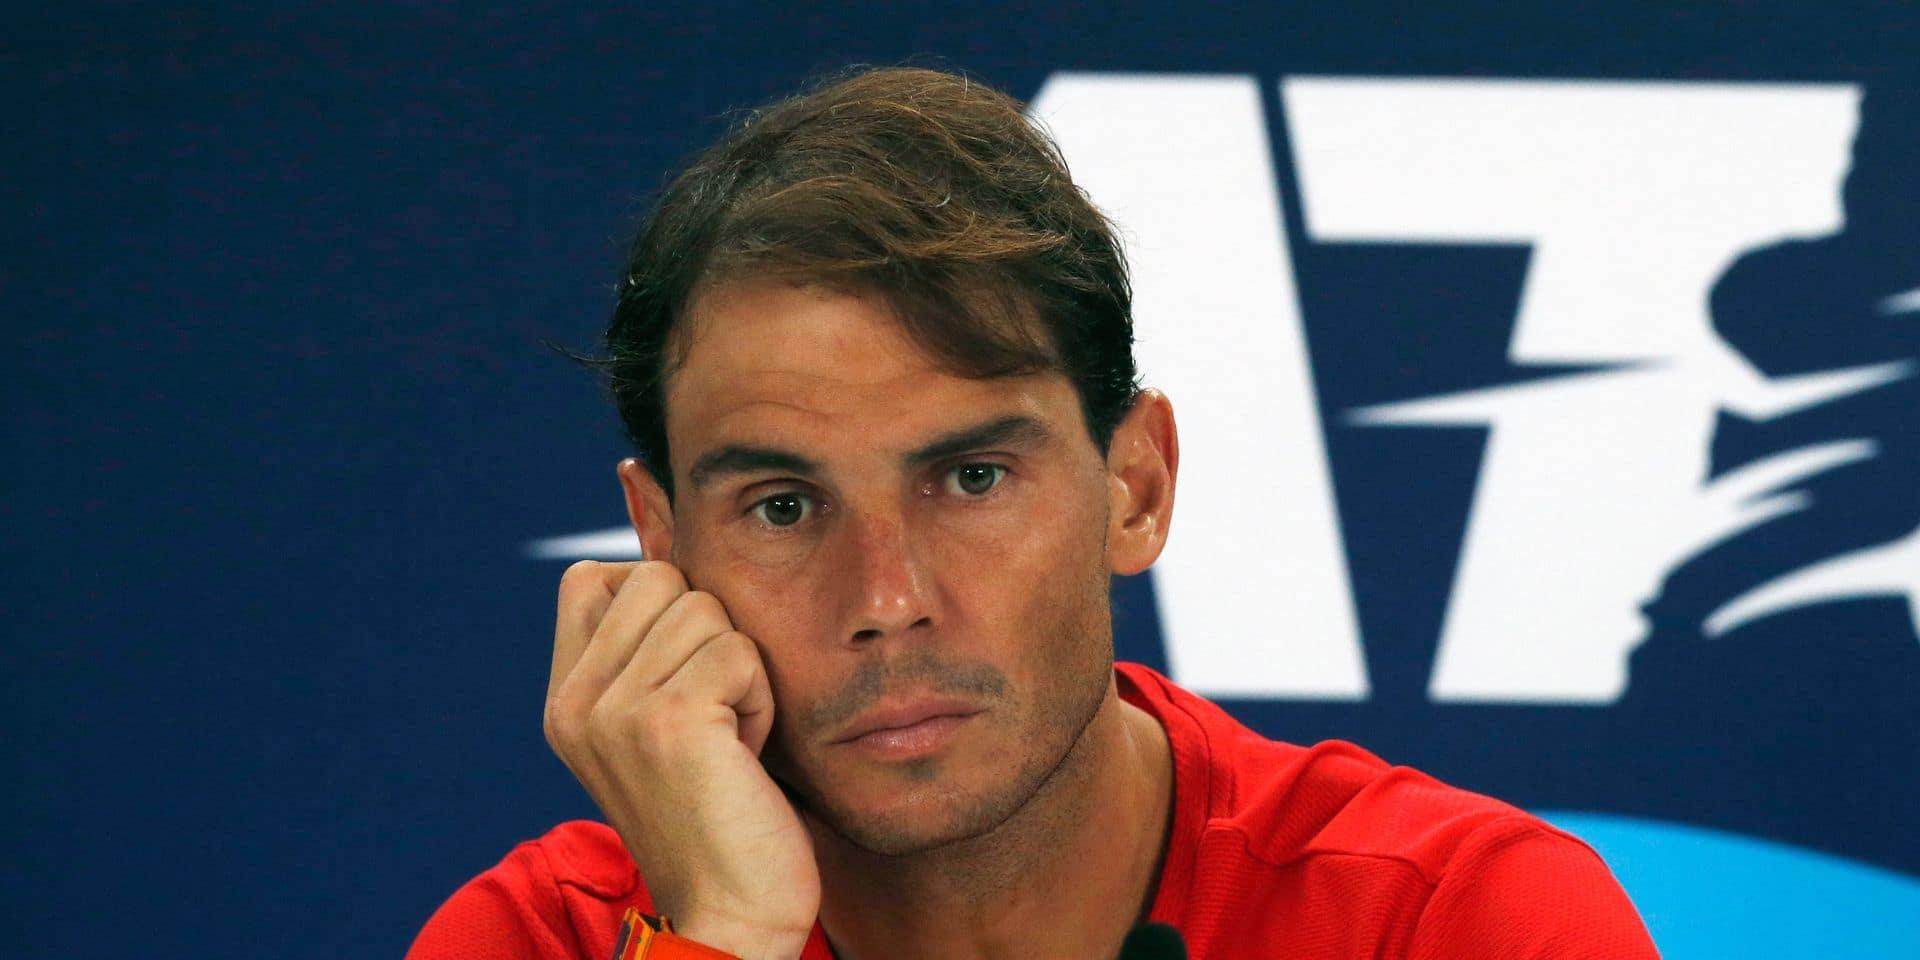 Rafael Nadal redemande la fusion de l'ATP Cup avec la Coupe Davis